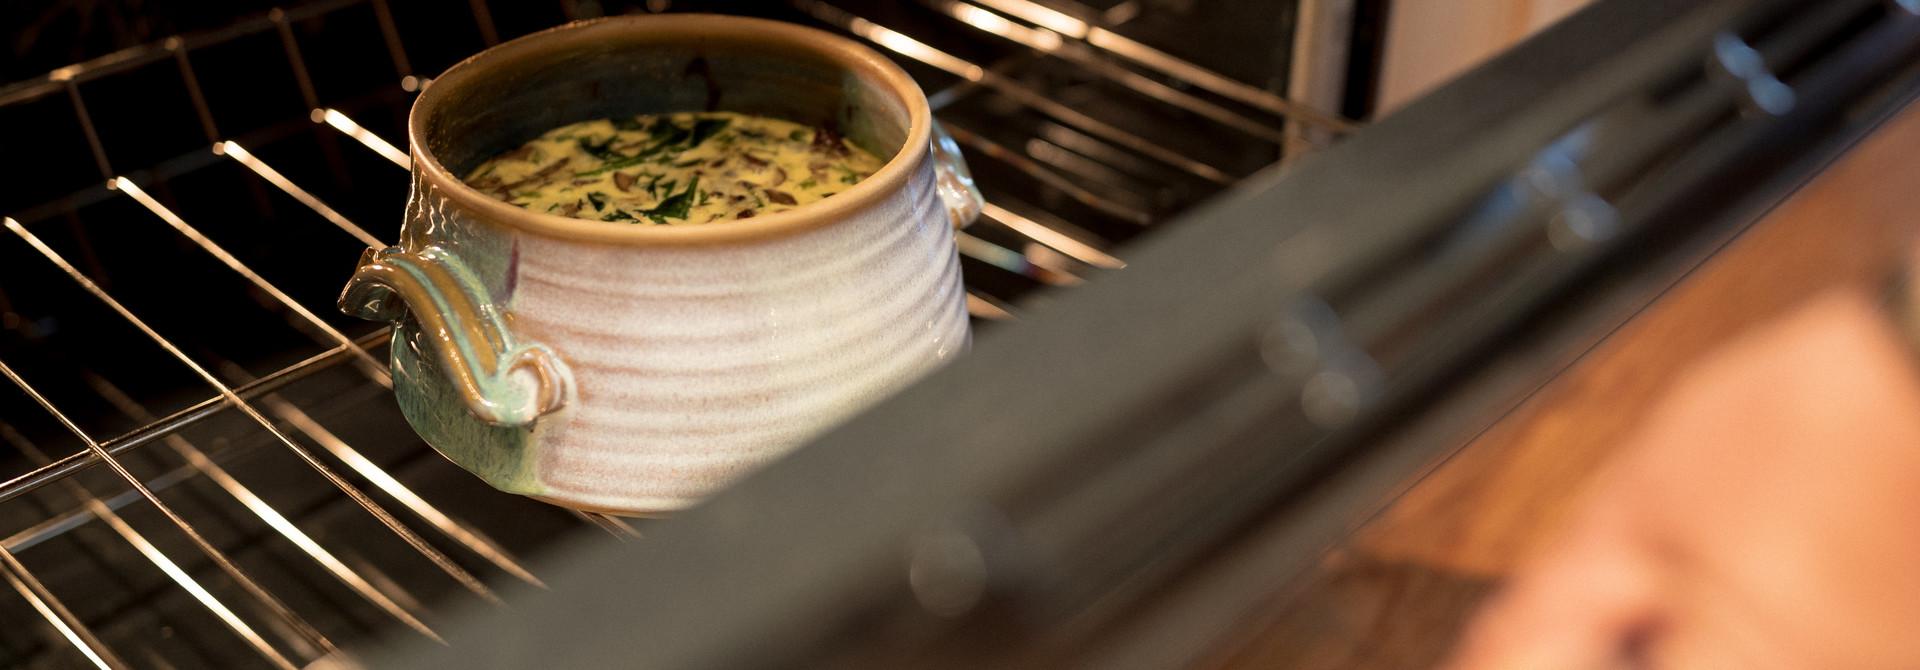 Cookware/Bakeware